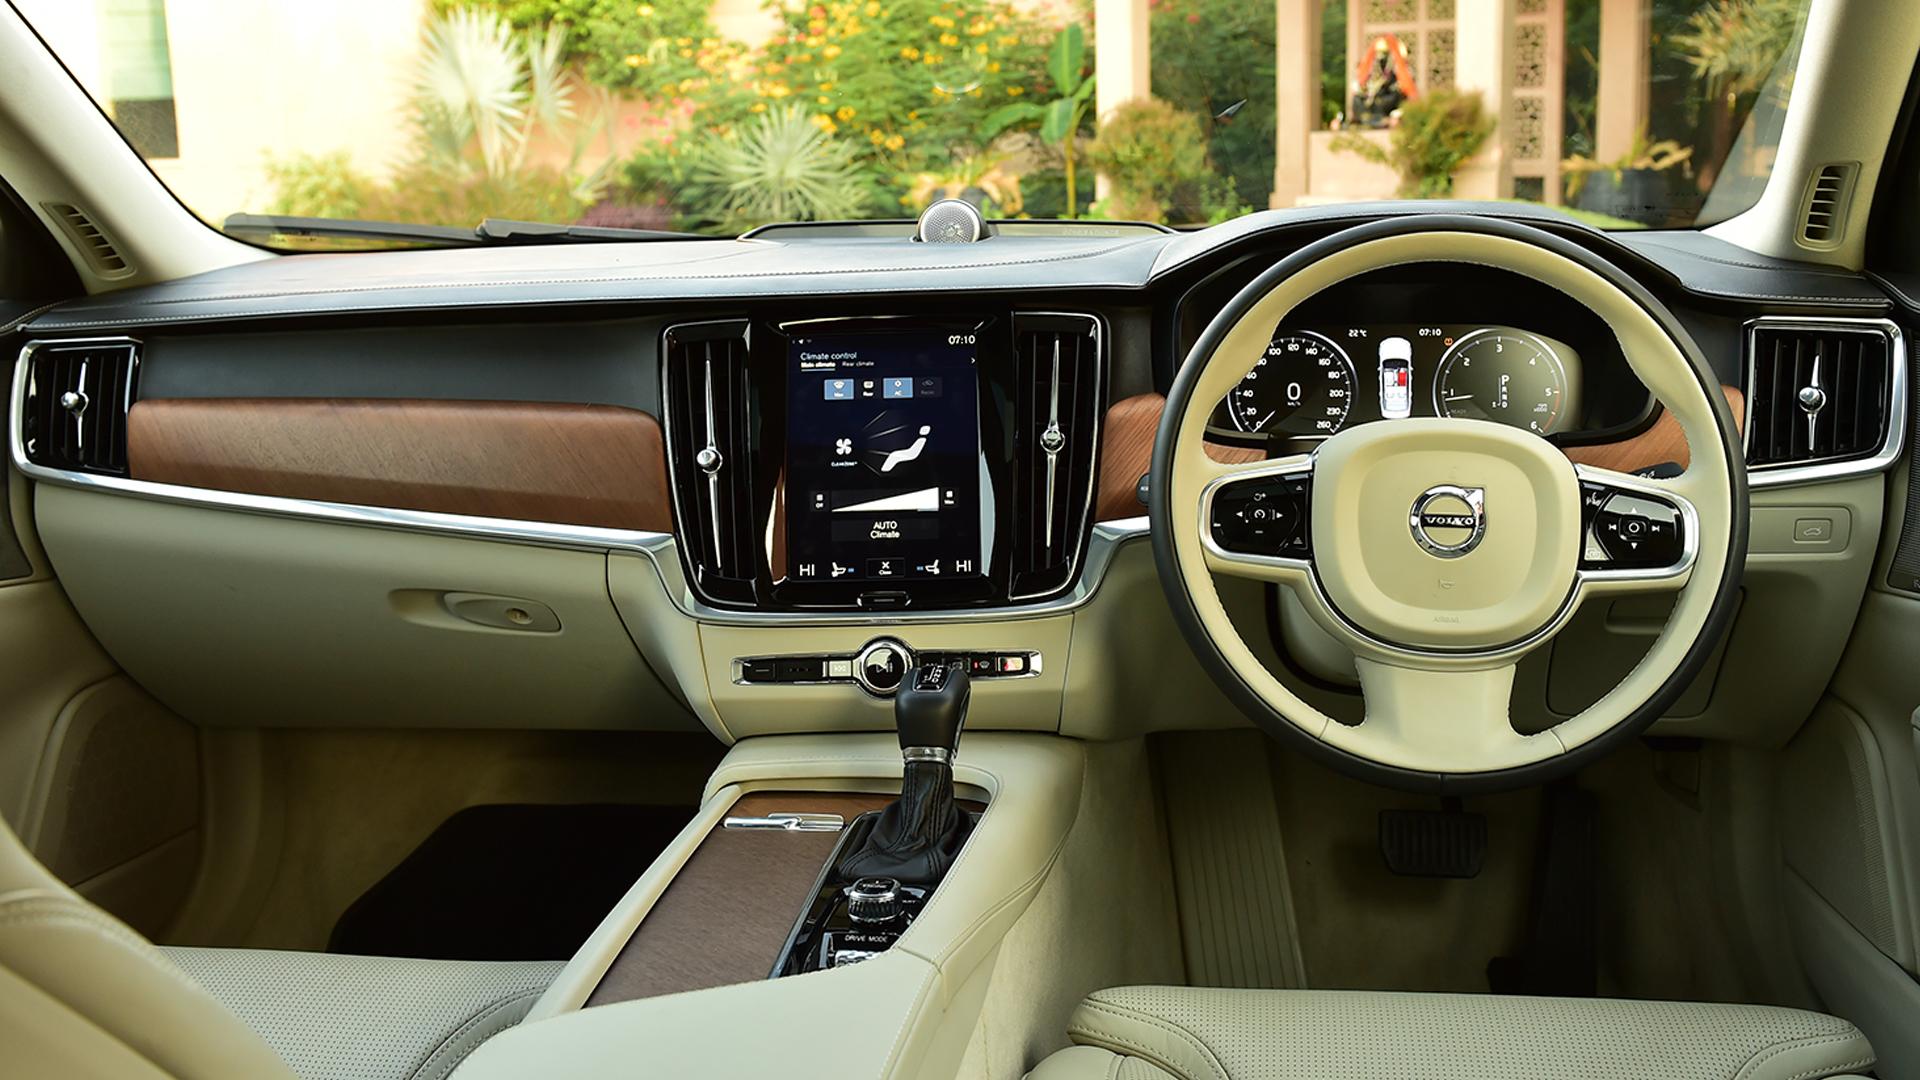 Volvo S90 2016 D4 Inscription Interior Car Photos Overdrive